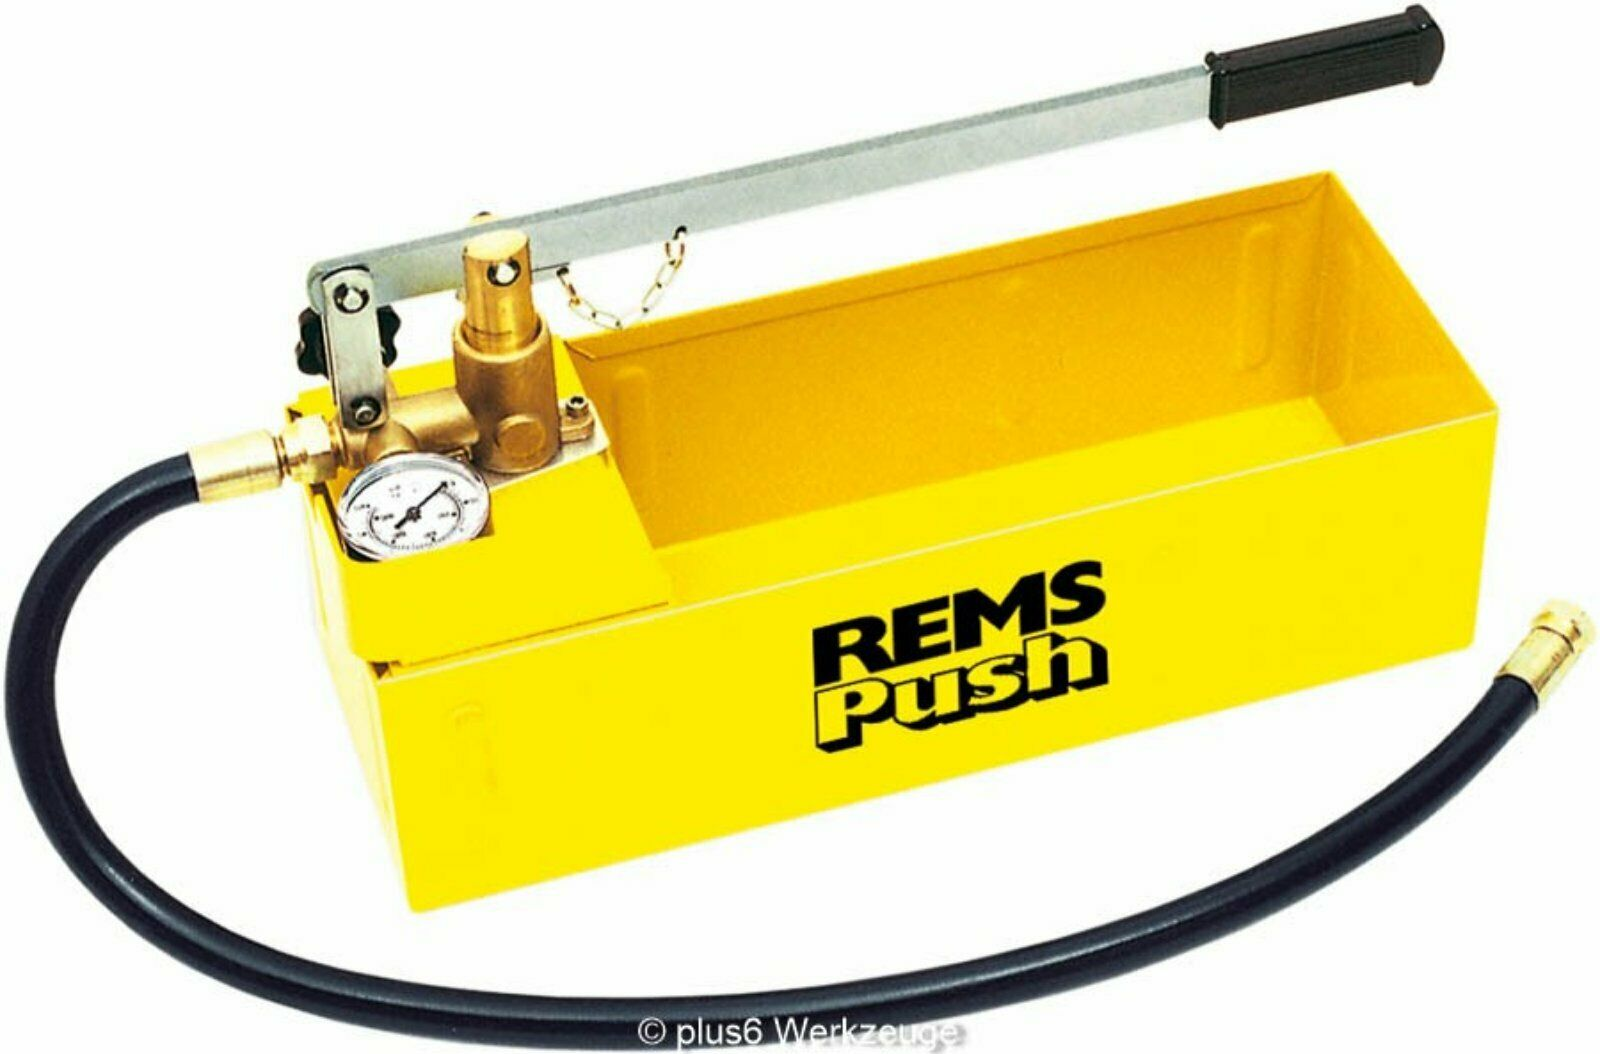 REMS Push Hand-Druckprüfpumpe